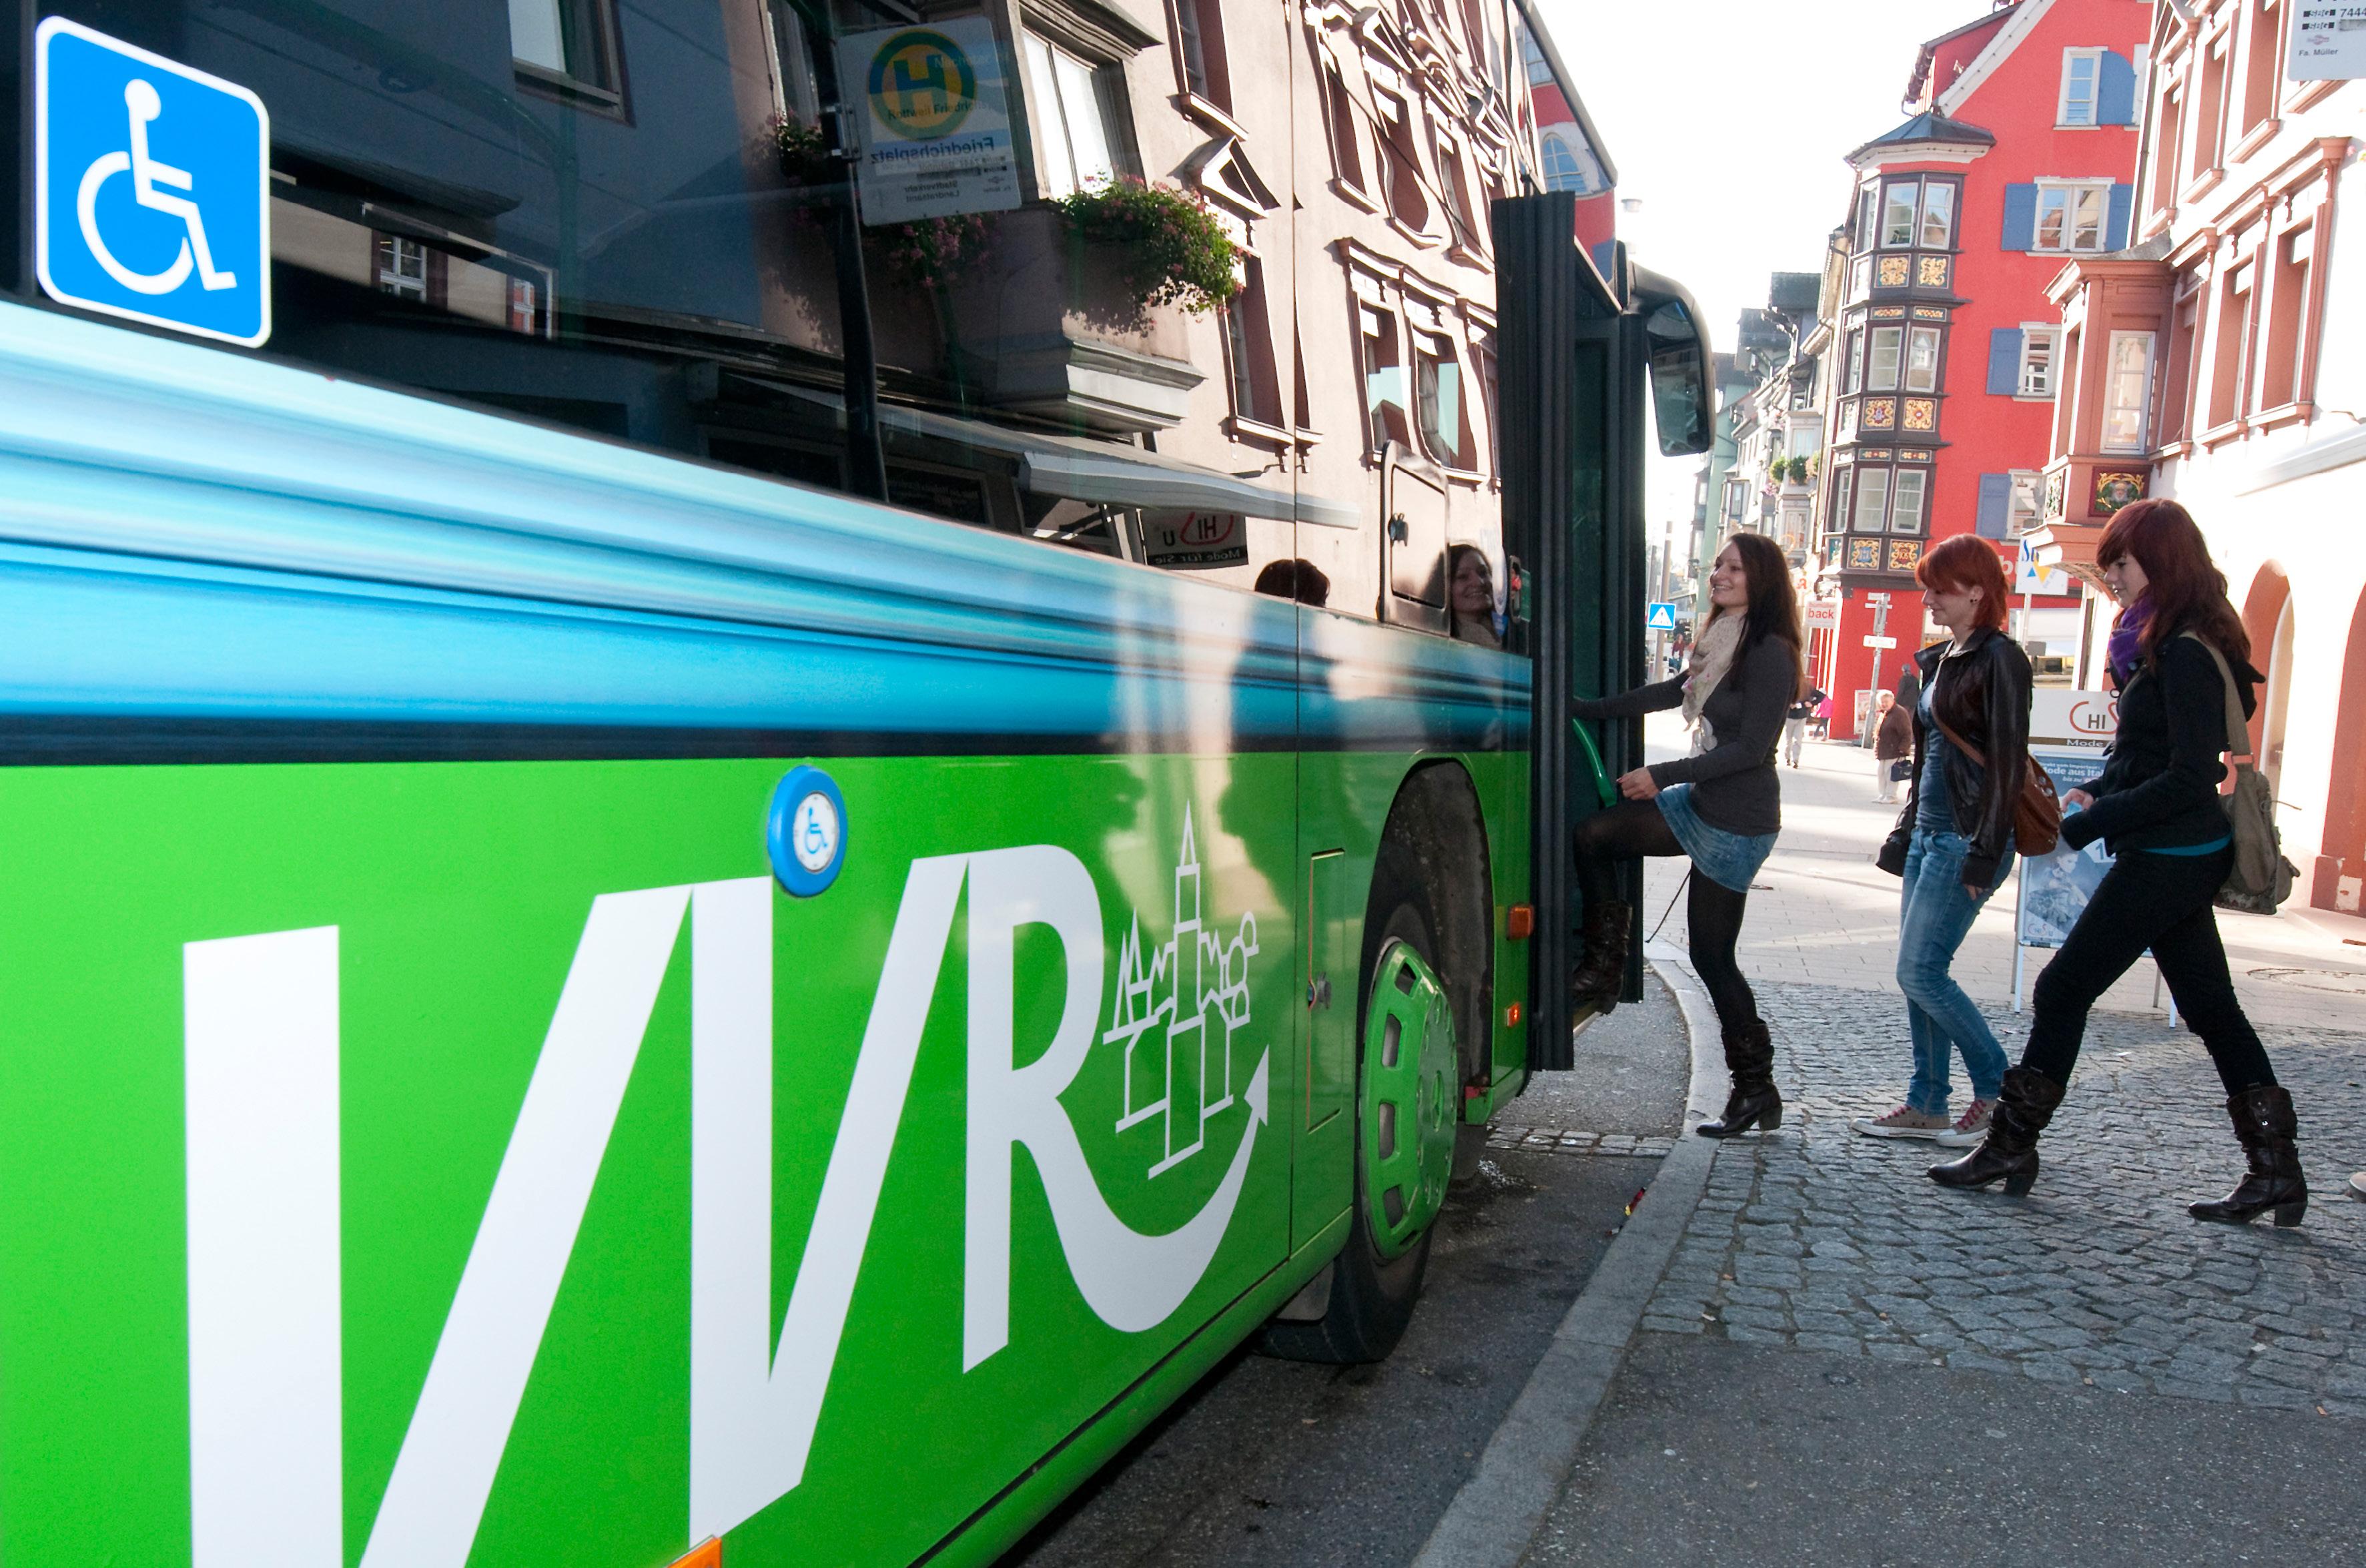 Linienbus-Komplettbeschriftung